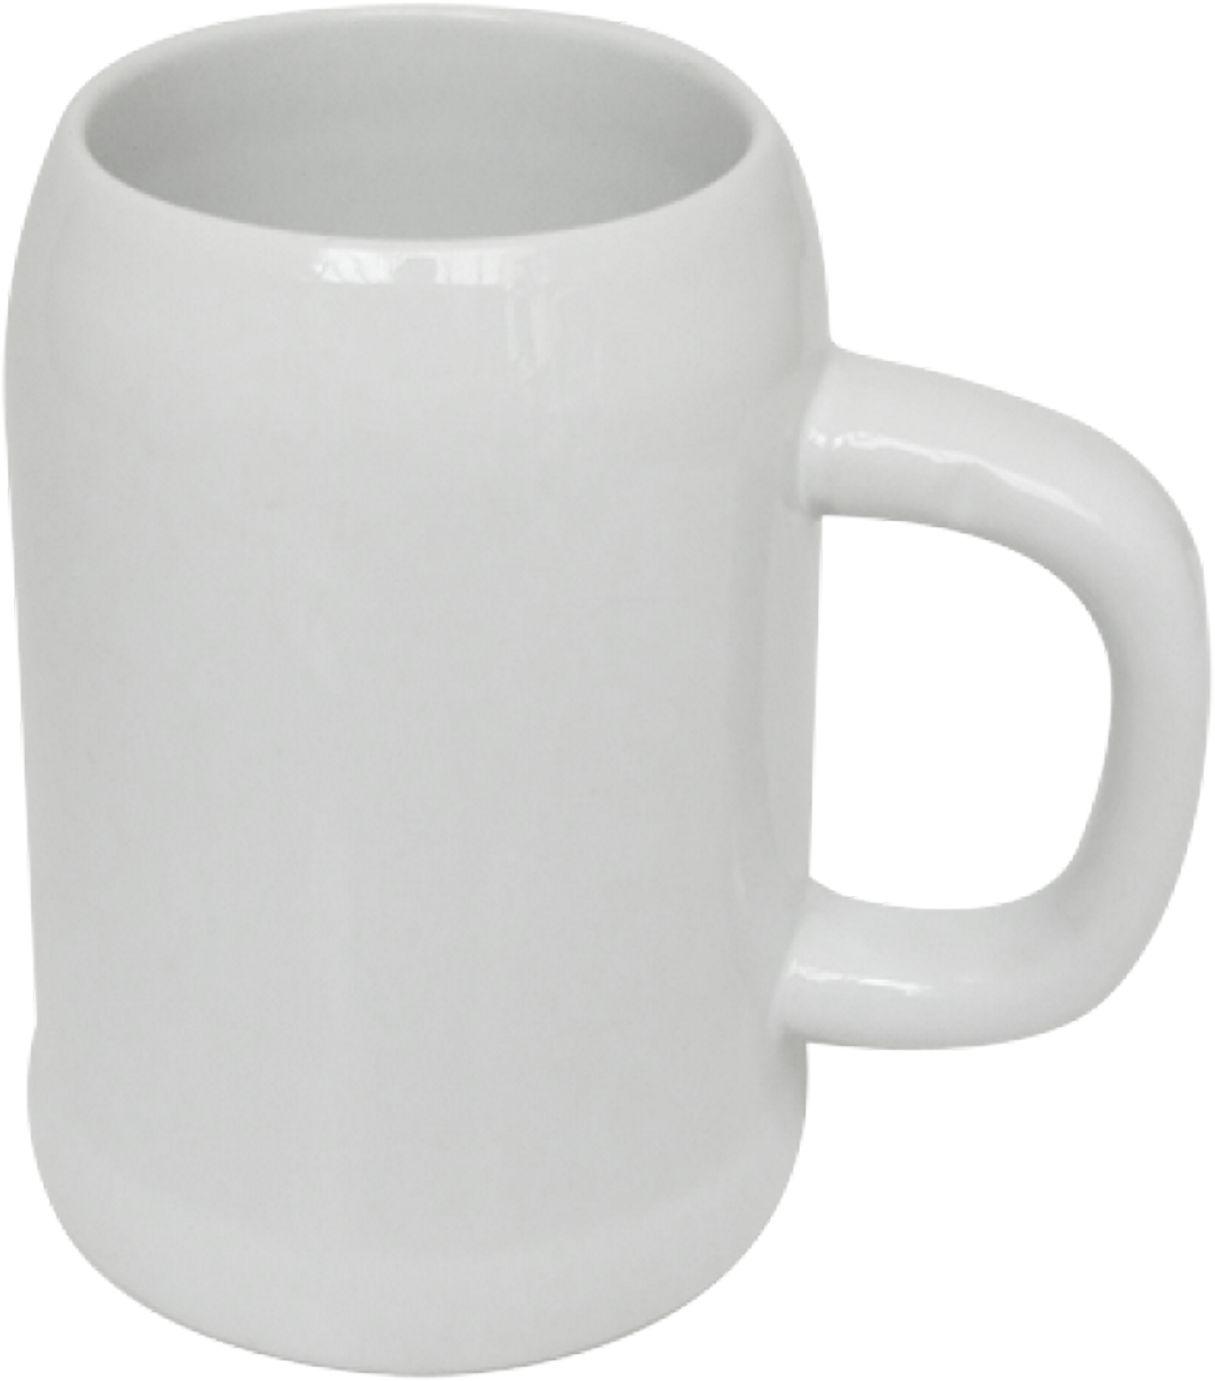 22oz Tankard Mug